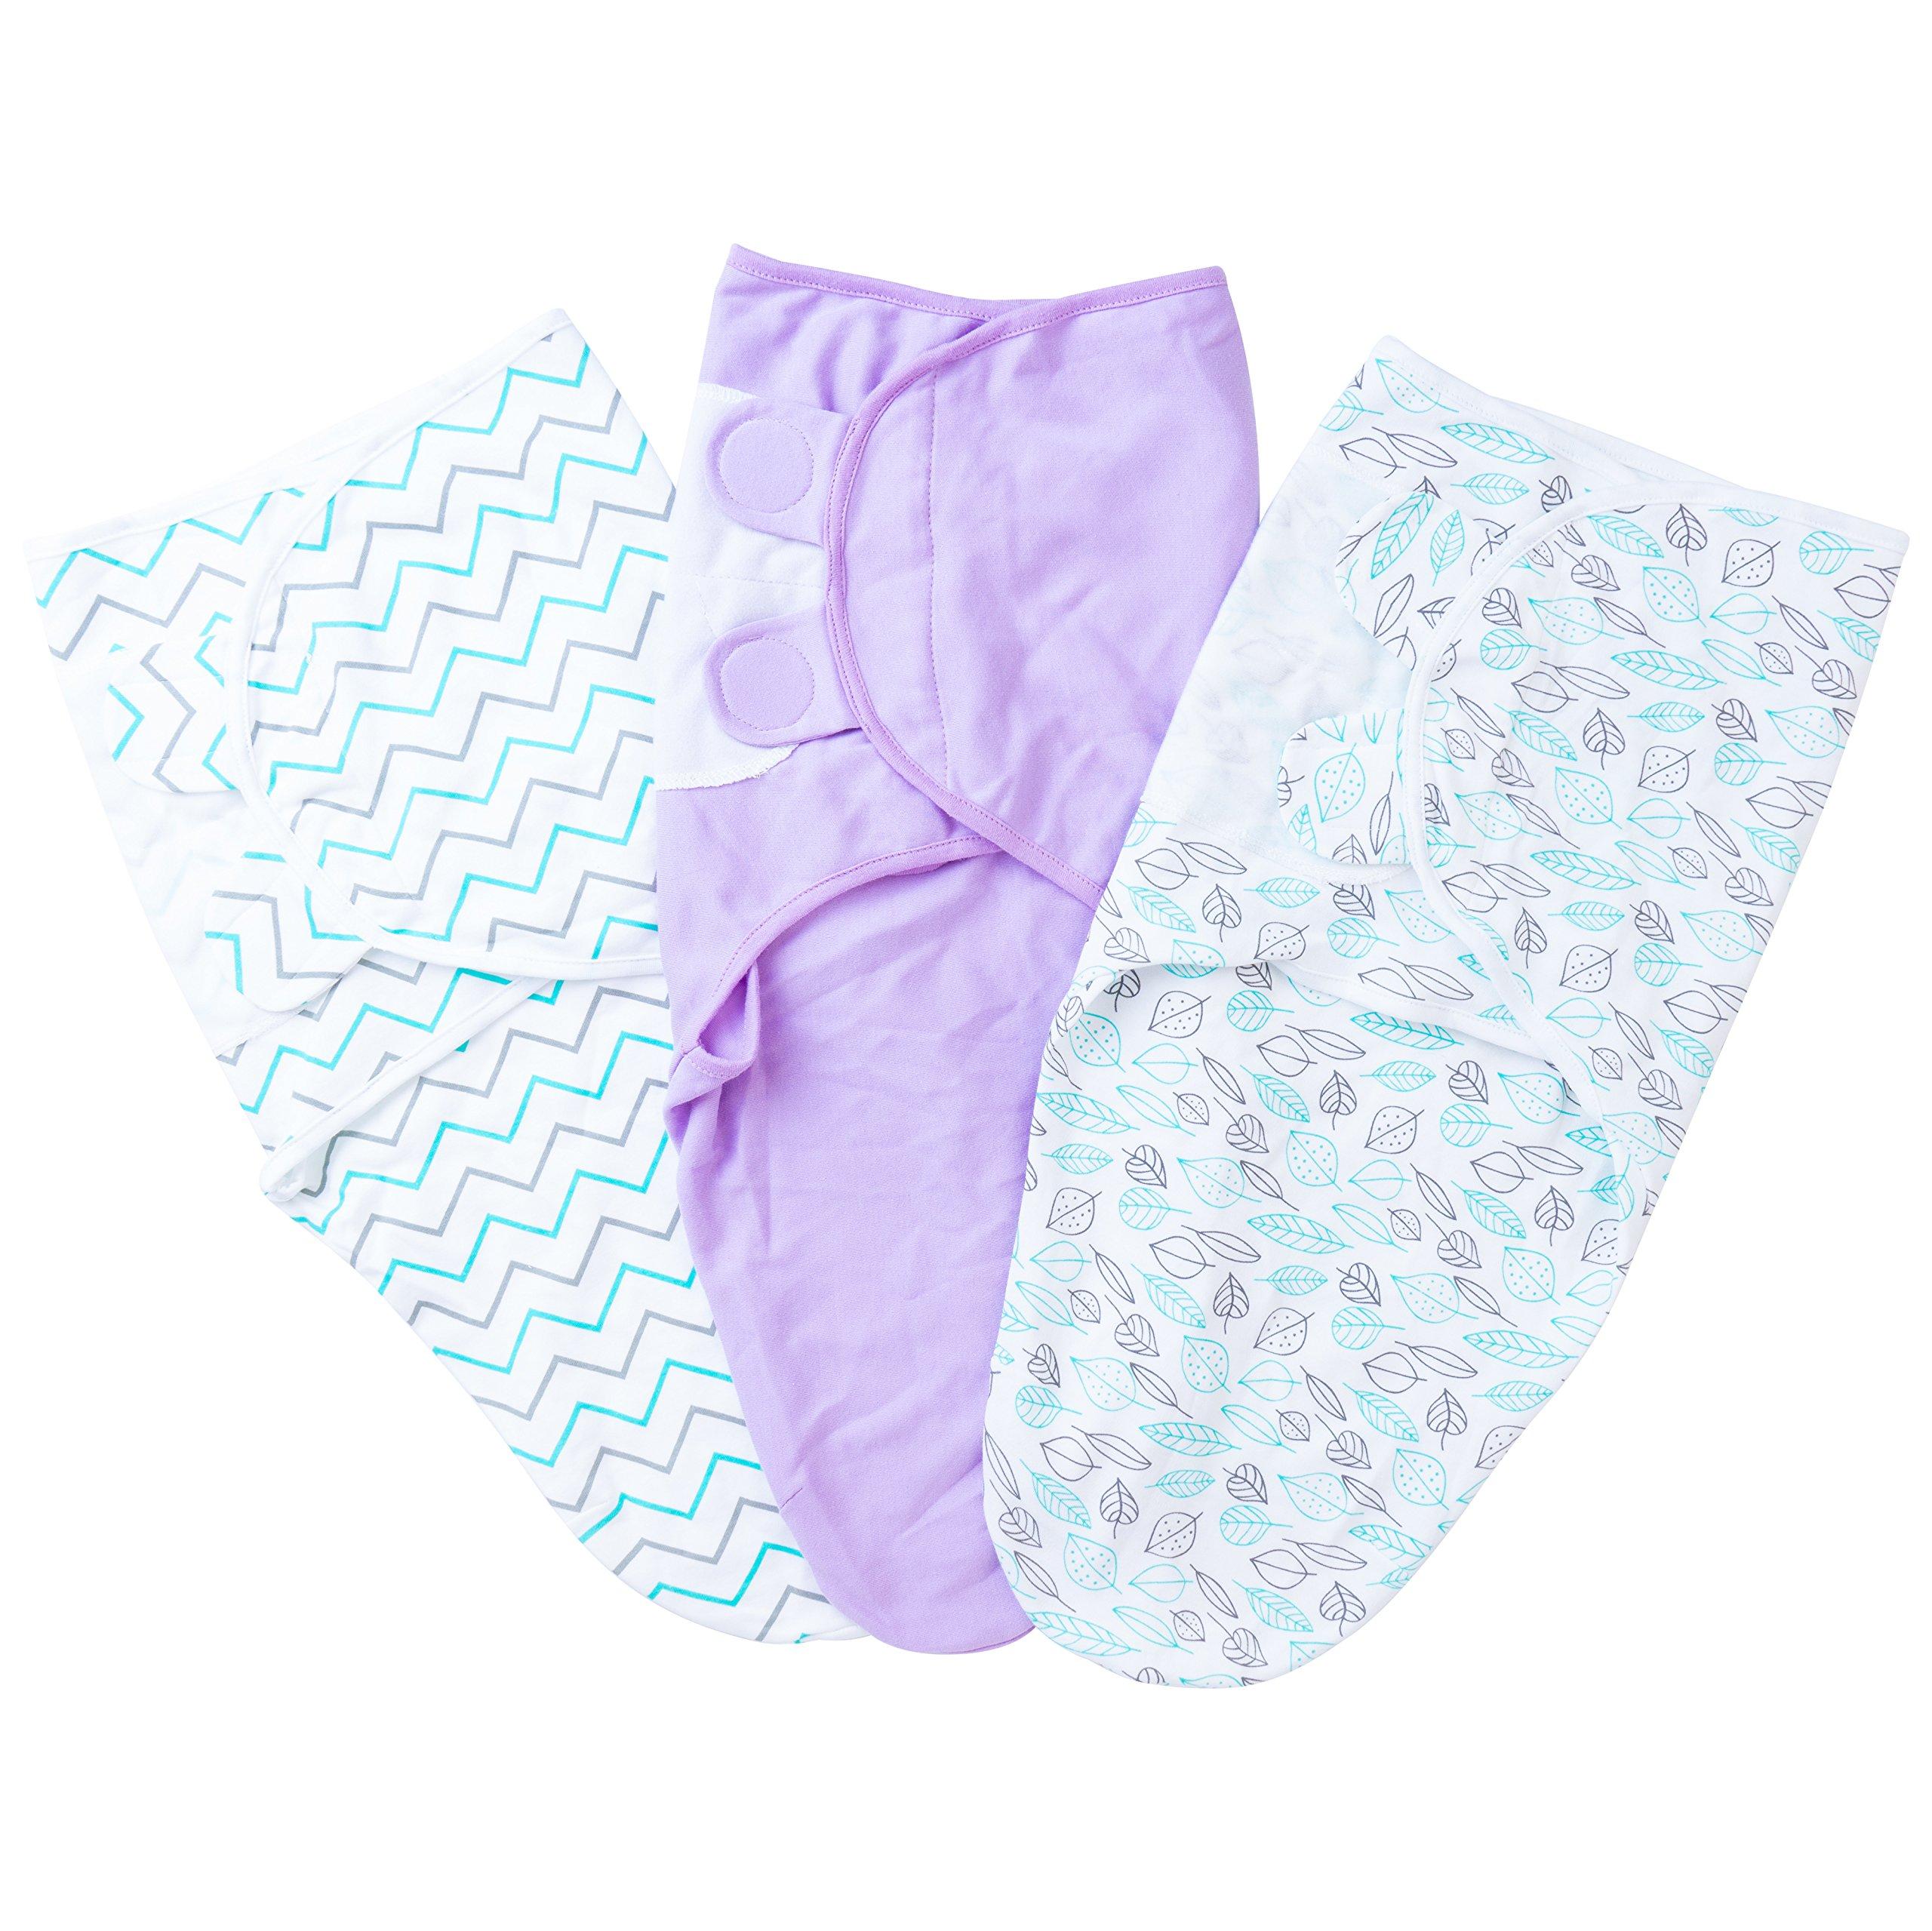 SanRaj Swaddles Swaddle Blanket 3 Pack Super Soft 100 % Muslin Cotton Baby Wrap - Breathable Plush Adjustable Infant Baby Wrap Blanket – Unisex, Warm & Comfy